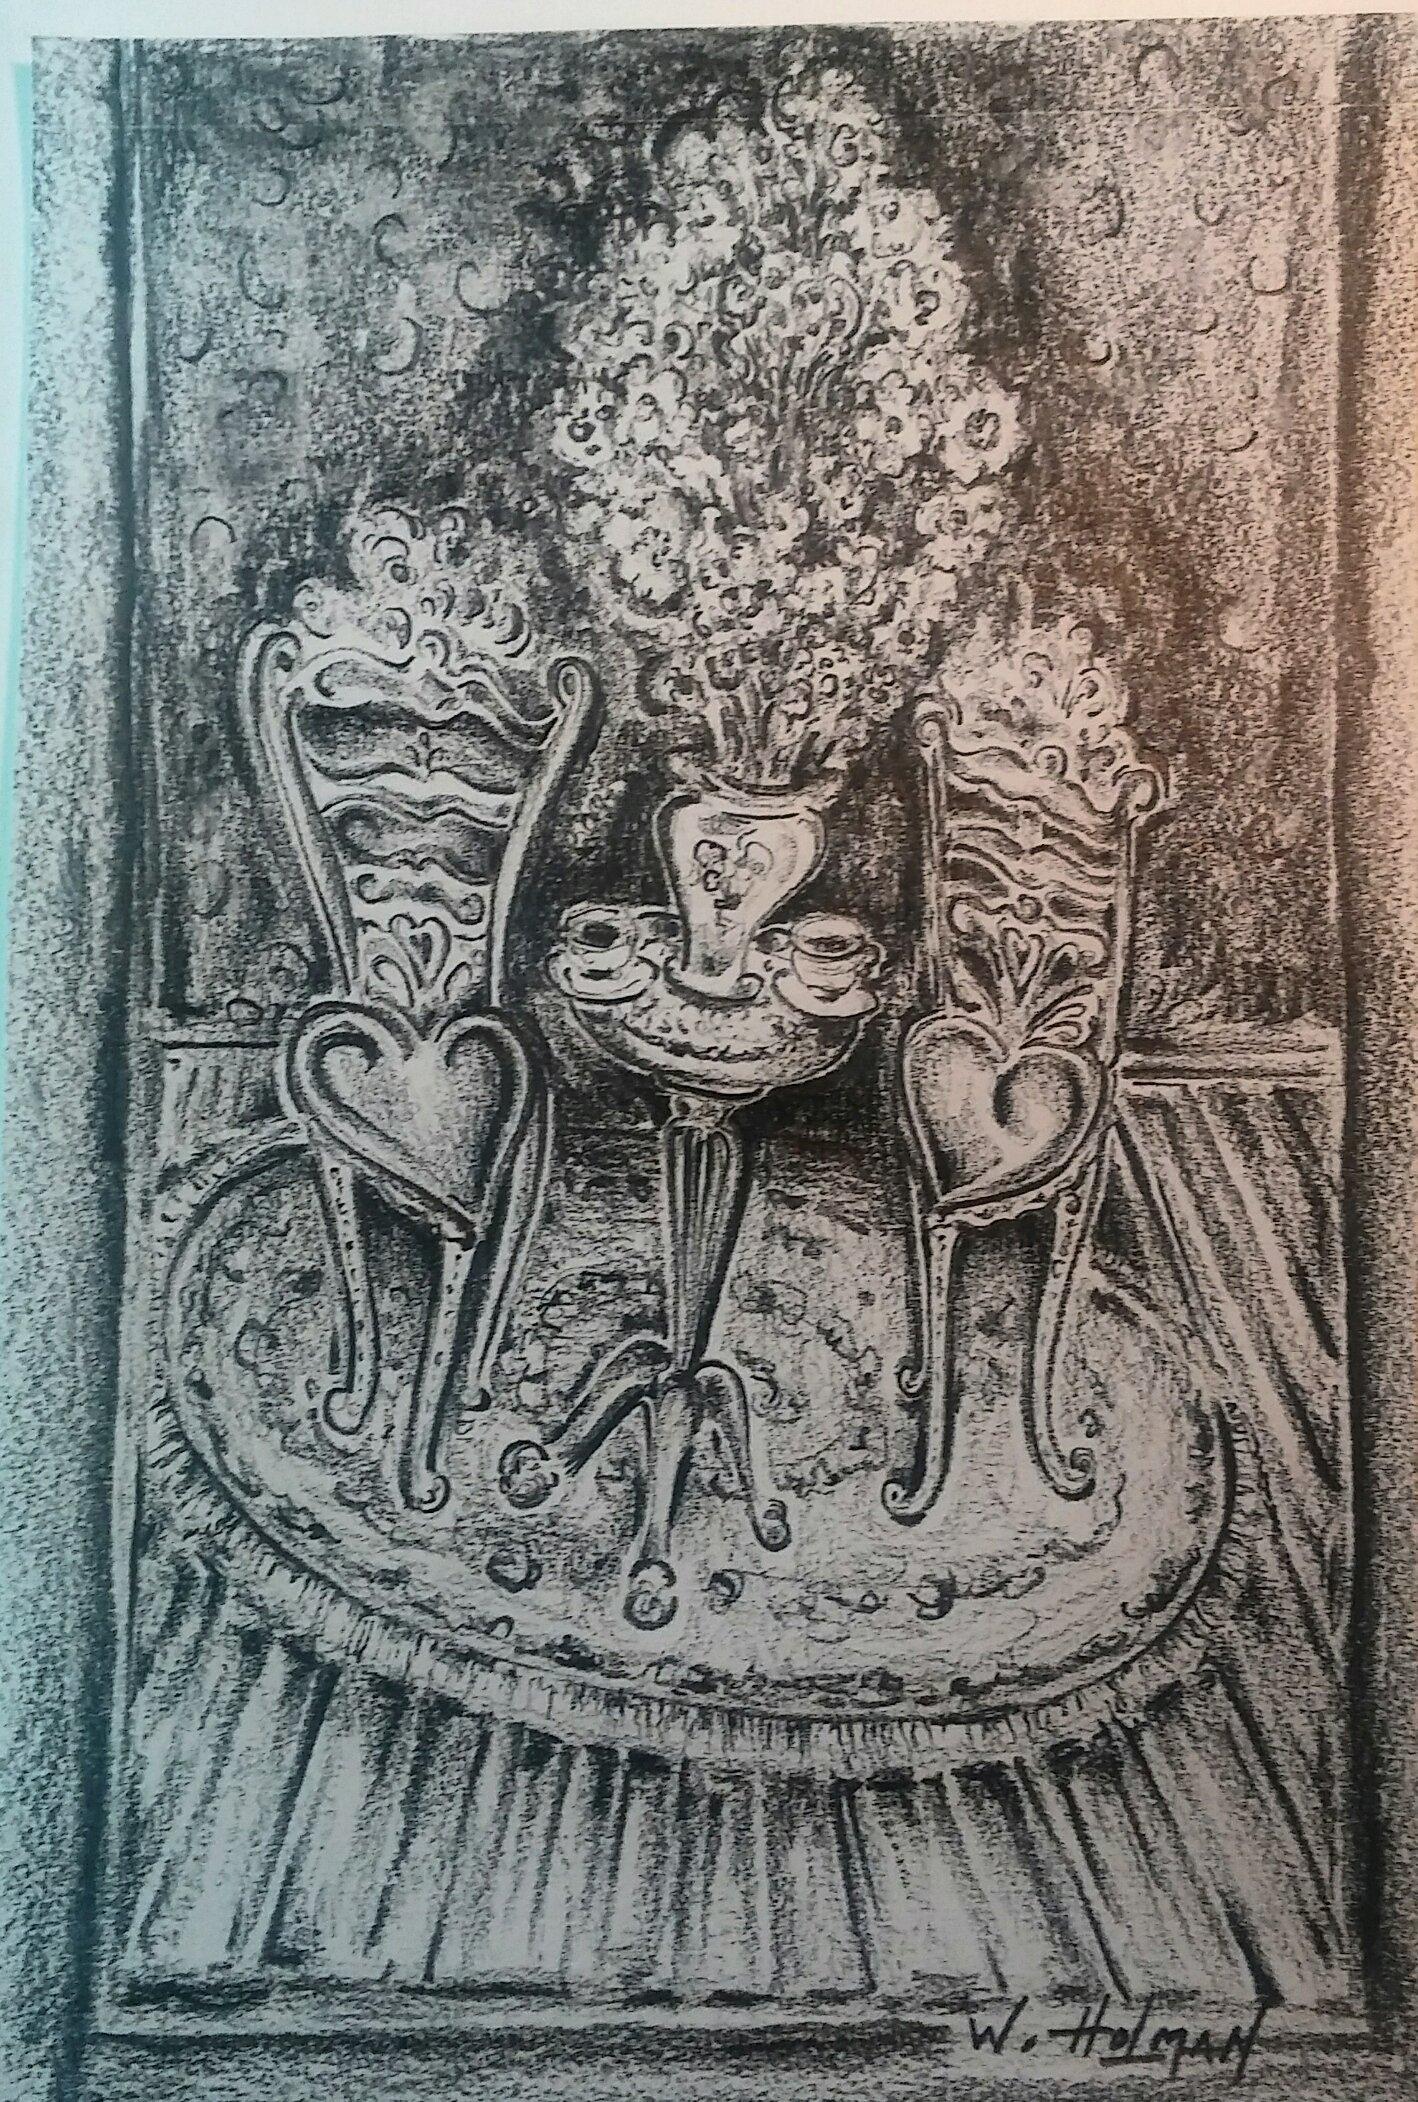 TEA FOR TWO ORIGINAL SKETCH BY ARTIST WILLIAM HOLMAN by ARTIST WILLIAM HOLMAN